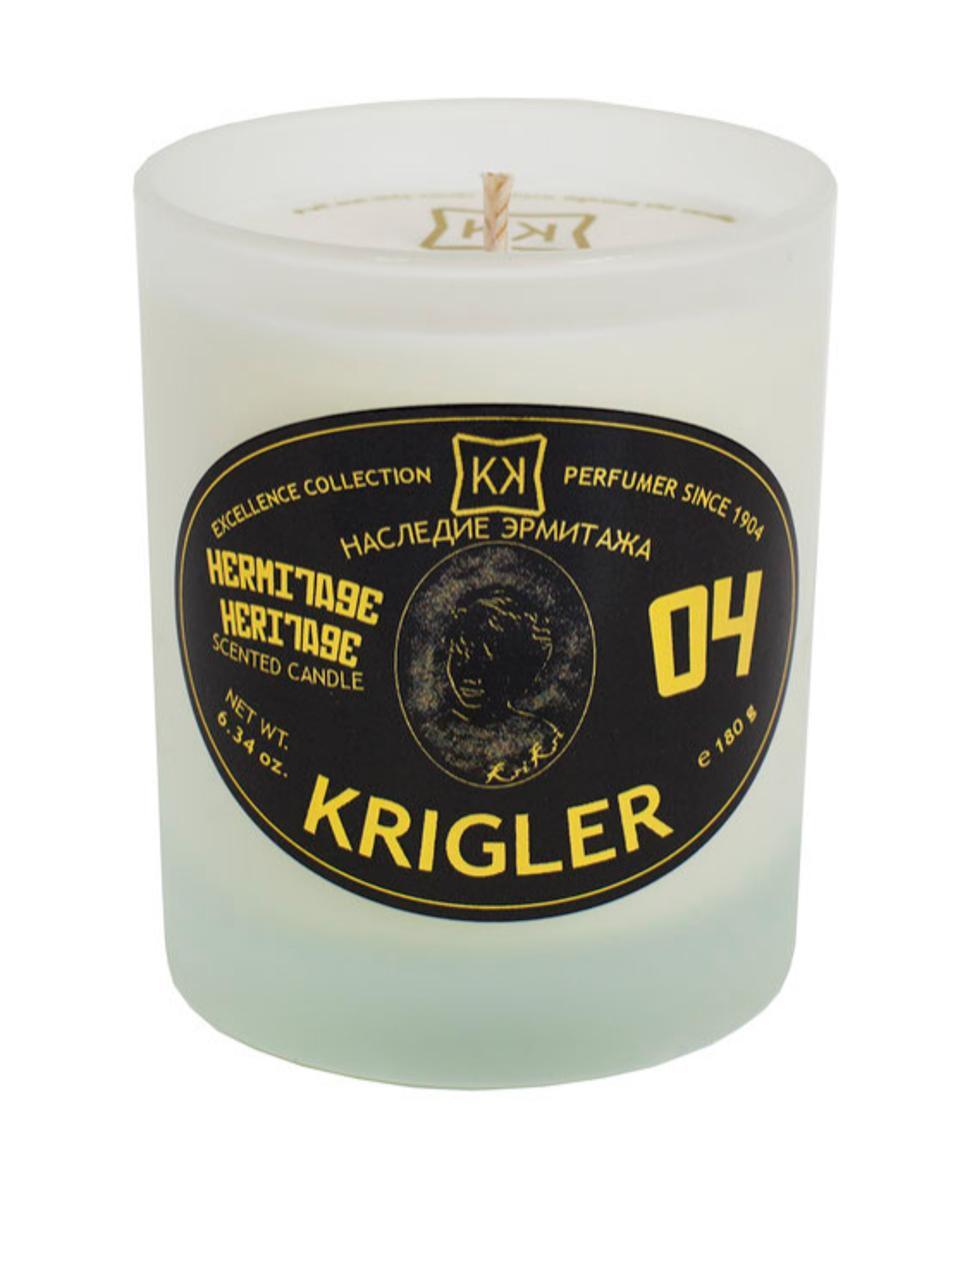 Krigler Hermitage Heritage Candle